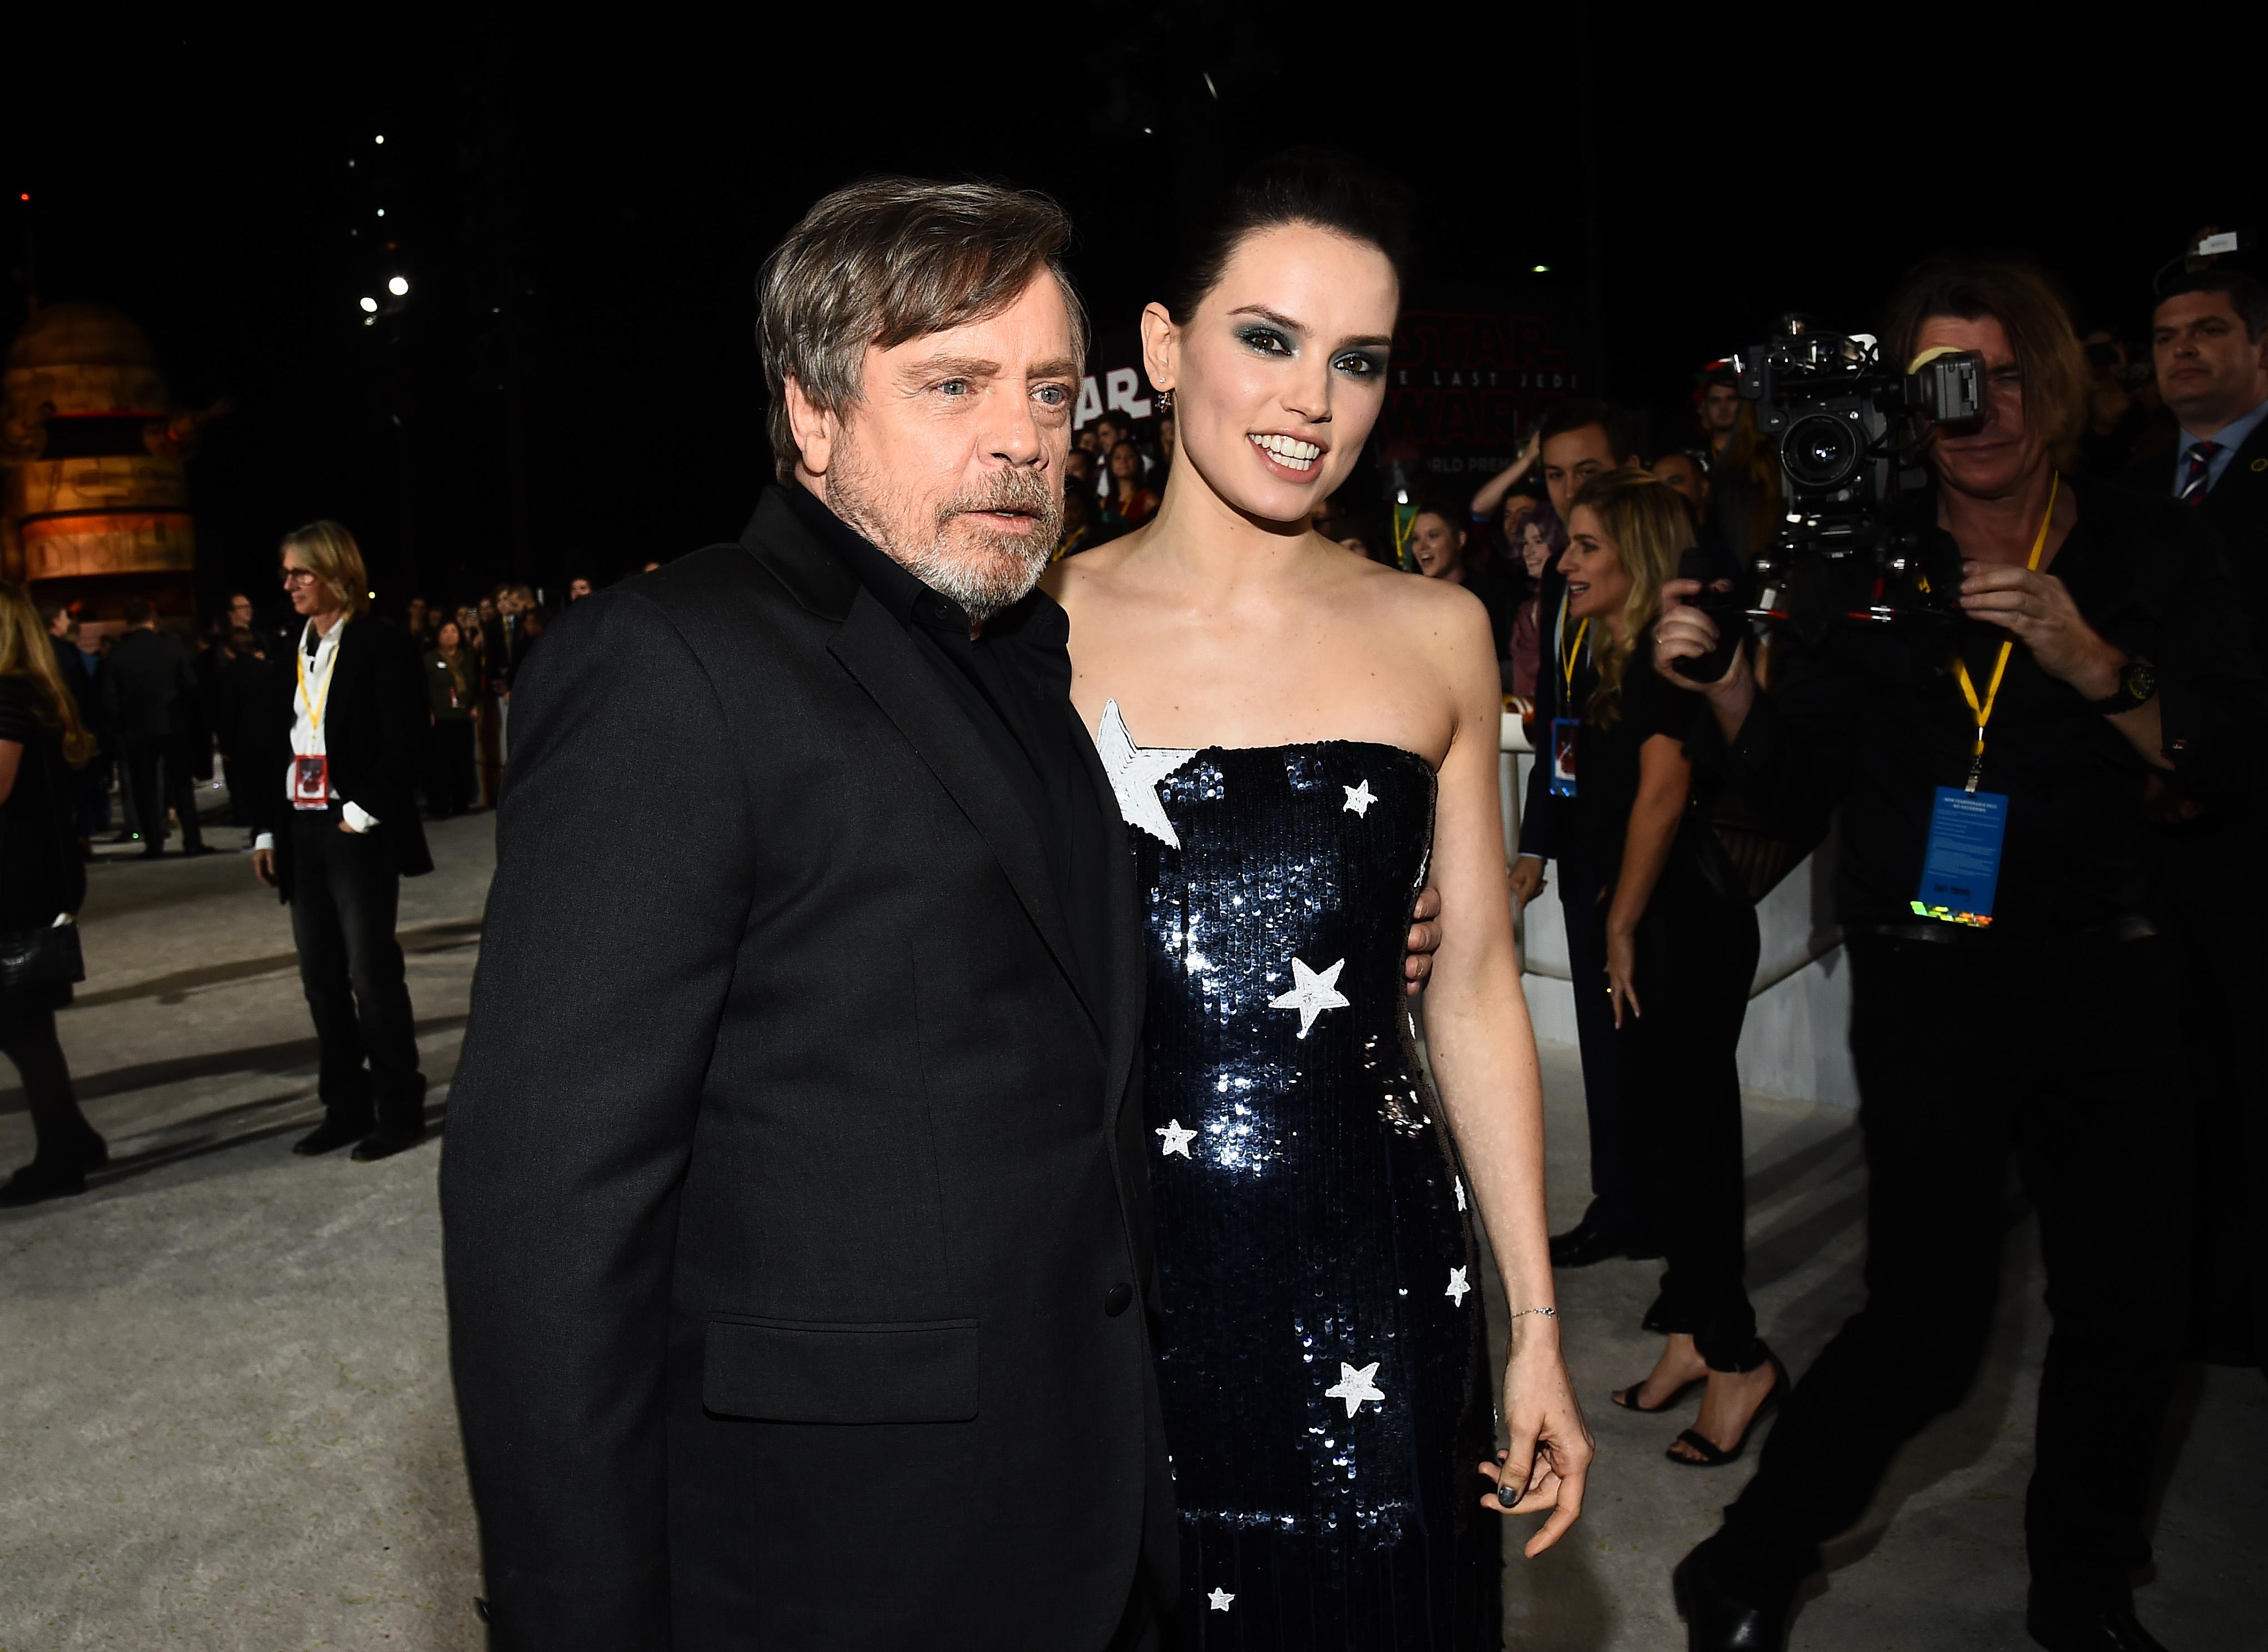 Mark Hamill and Daisy Ridley'Star Wars: The Last Jedi' film premiere, Arrivals, Los Angeles, USA - 09 Dec 2017